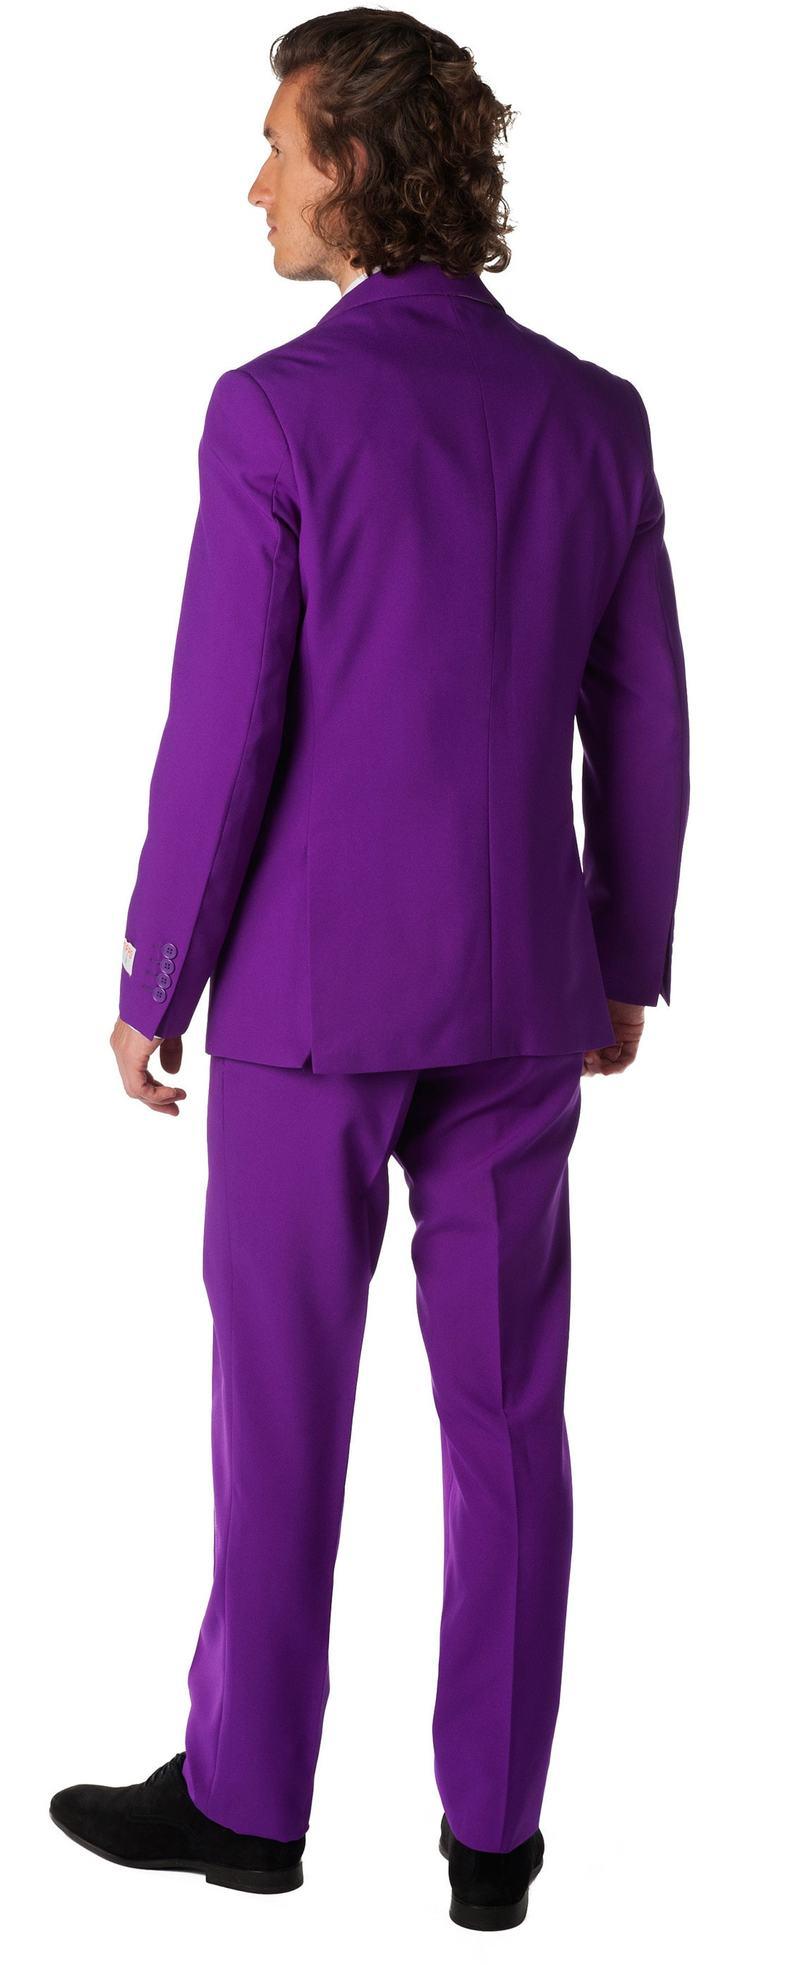 OppoSuits Purple Prince Kostüm Foto 1